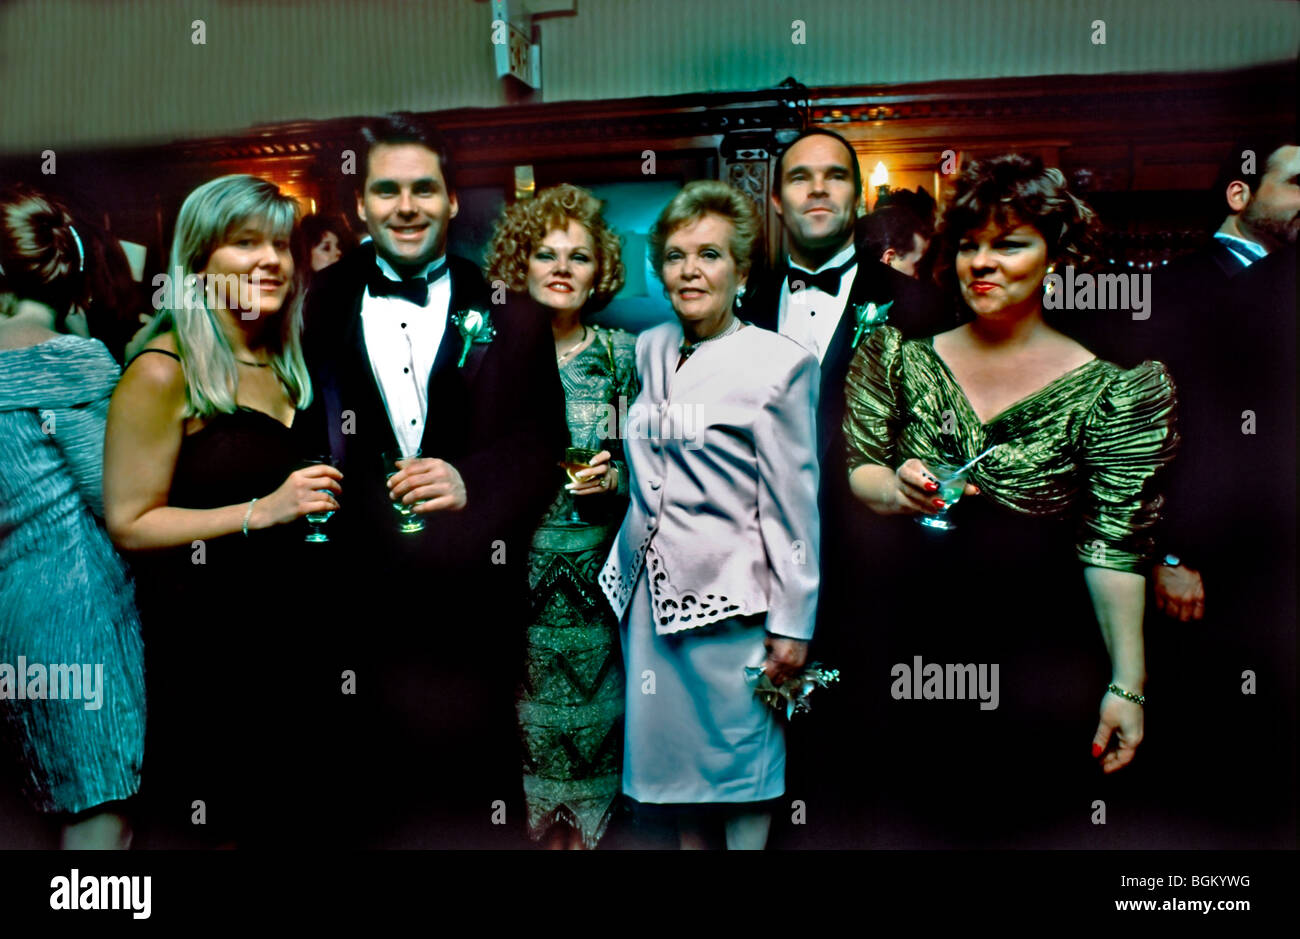 1990's Family Photo, Family Portrait Drinking at  Wedding. 'Old Family Photos' - Stock Image